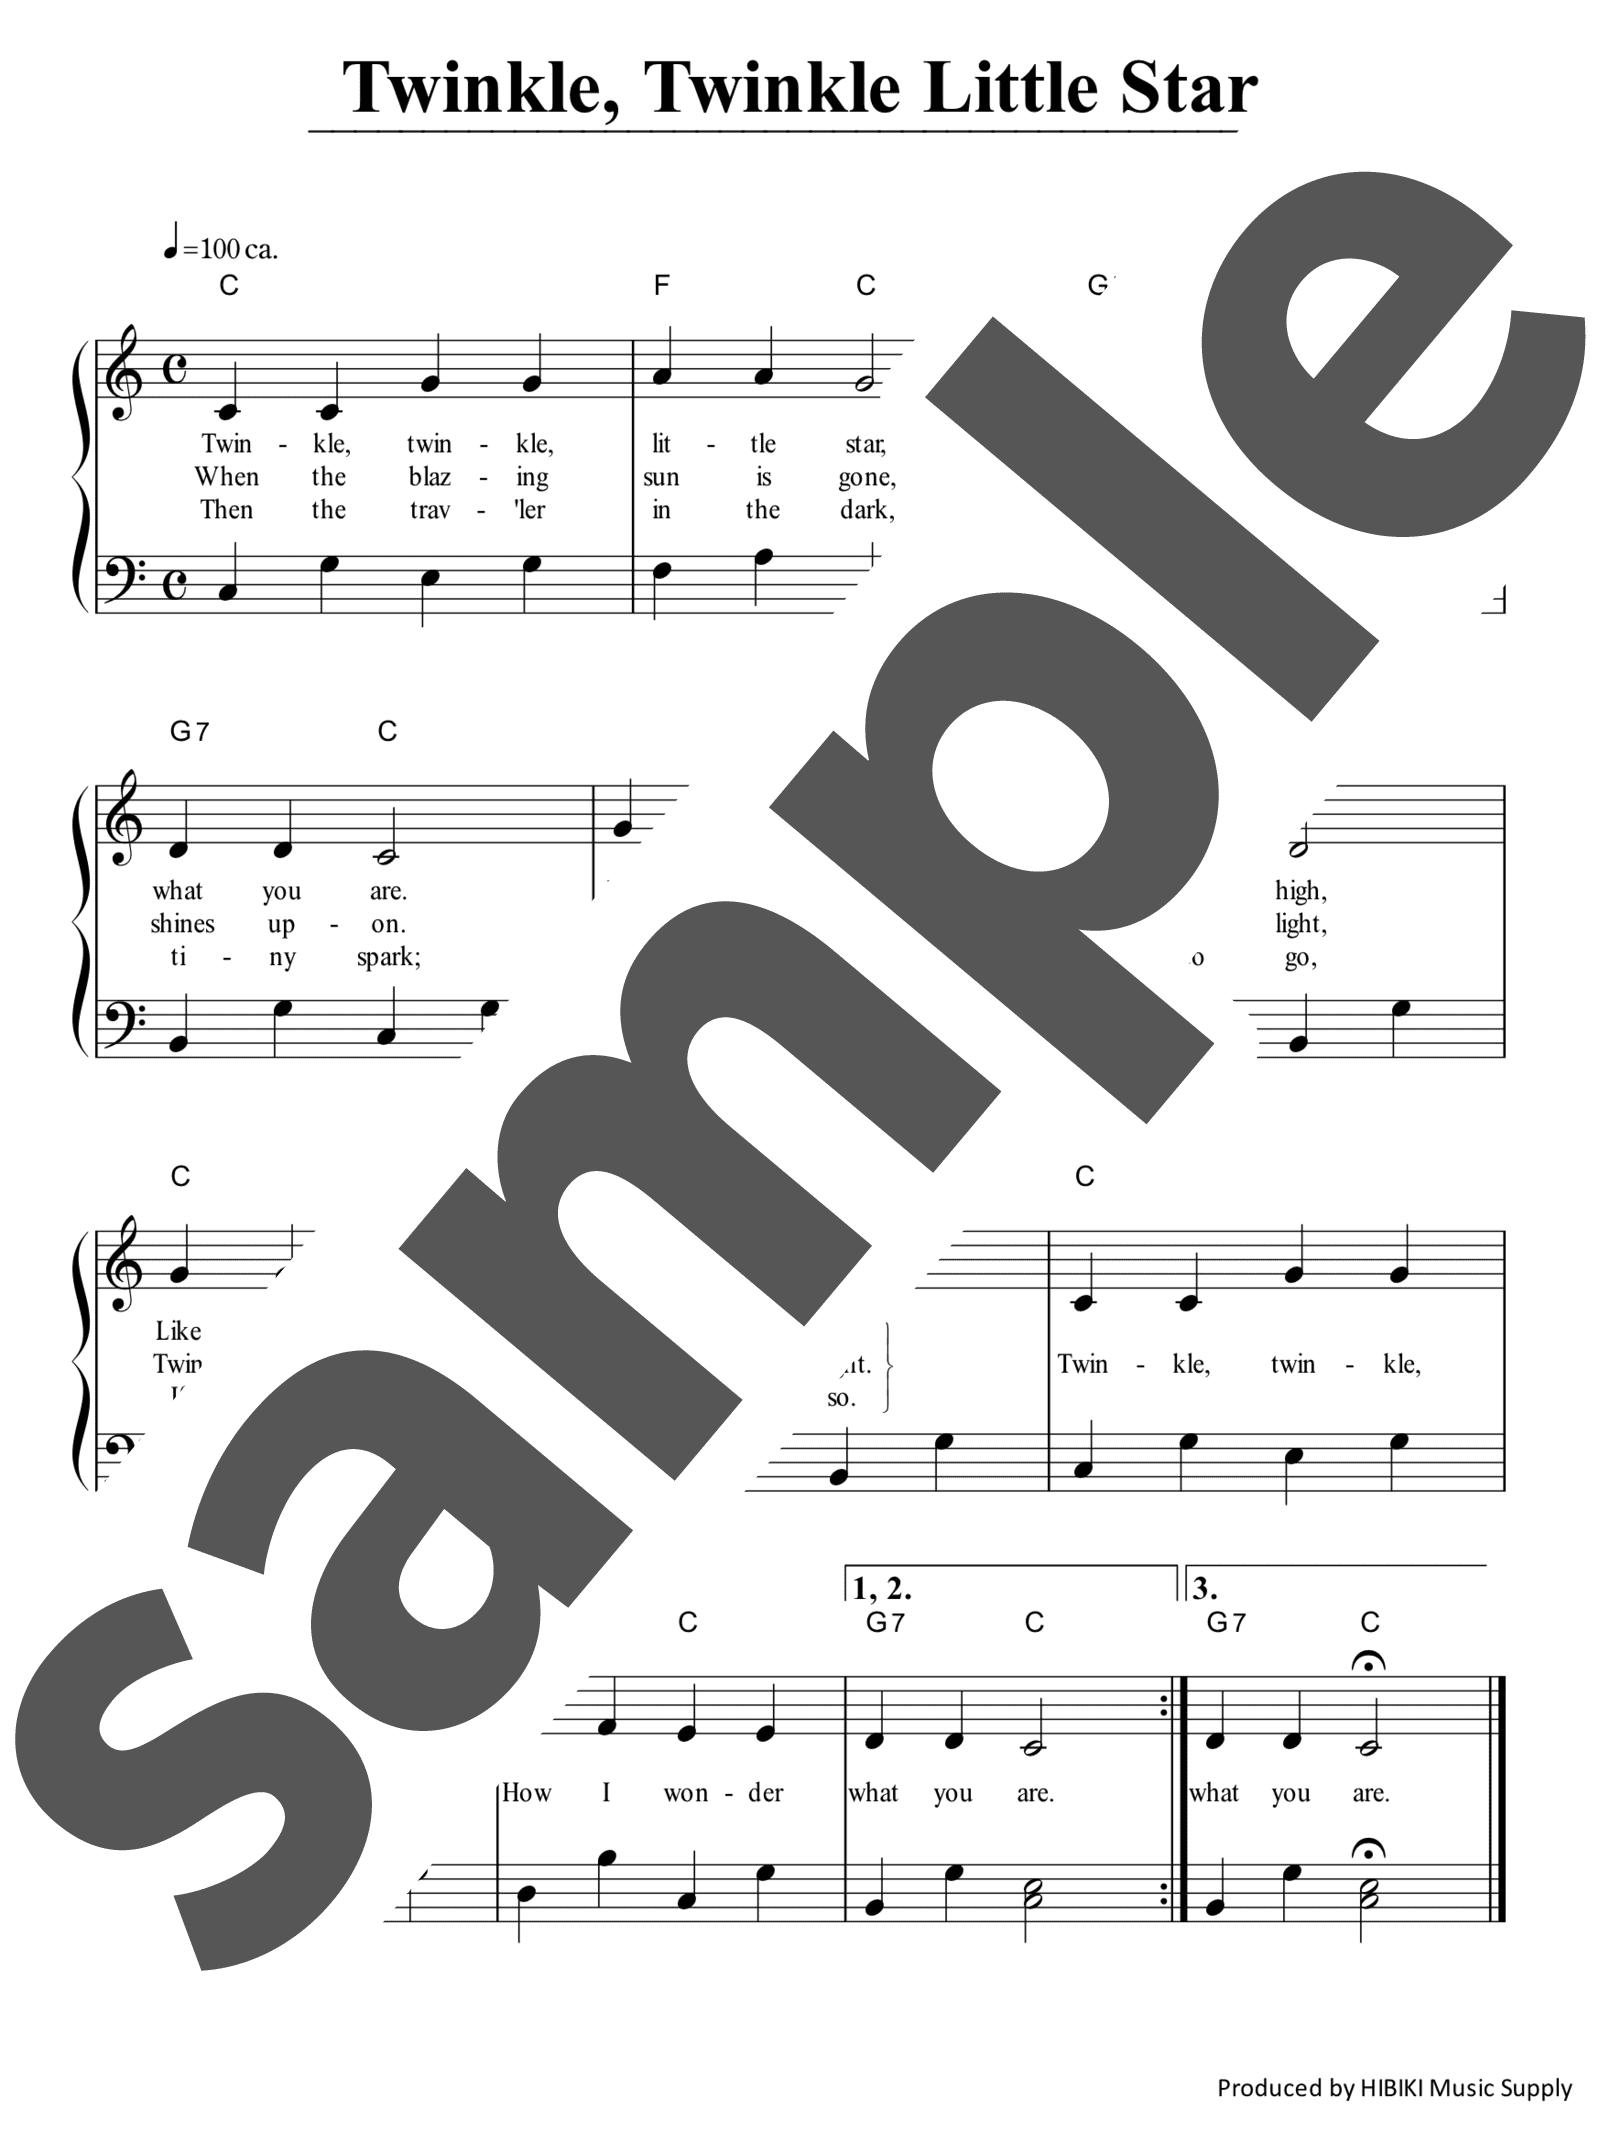 「Twinkle Twinkle Little Star」のサンプル楽譜